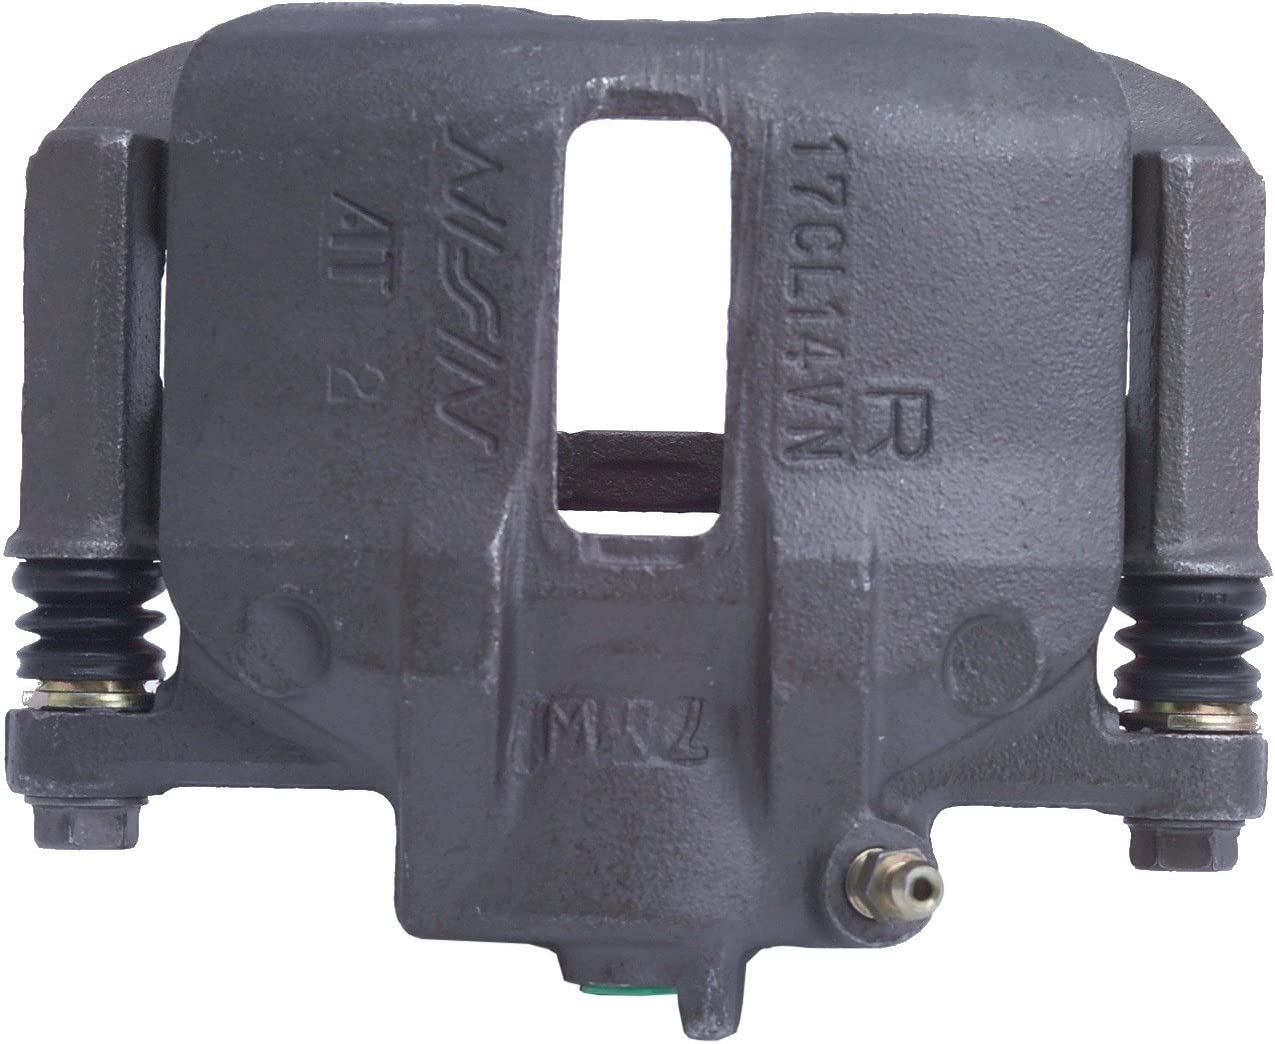 Brake Caliper Unloaded Cardone 19-B1004 Remanufactured Import Friction Ready